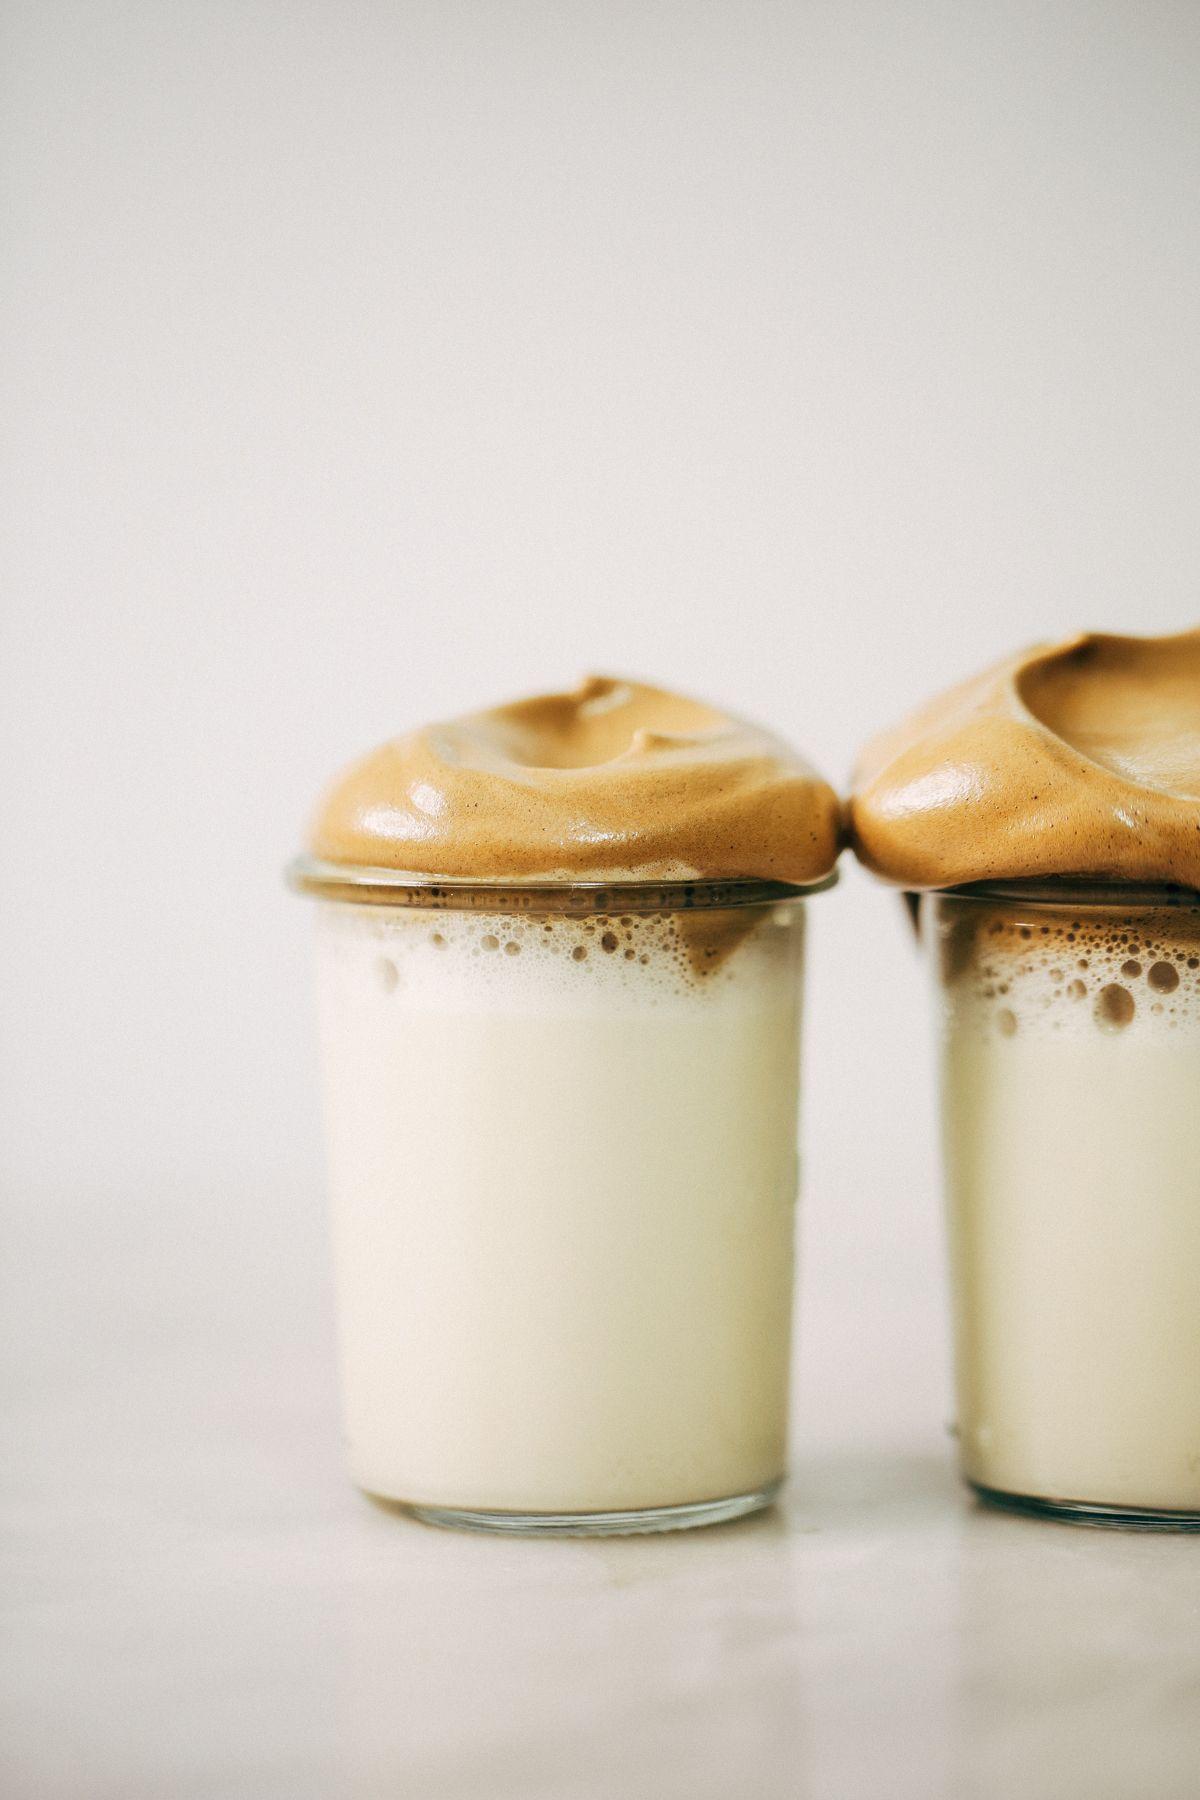 Paleo Dalgona Coffee Recipe in 2020 Food recipes